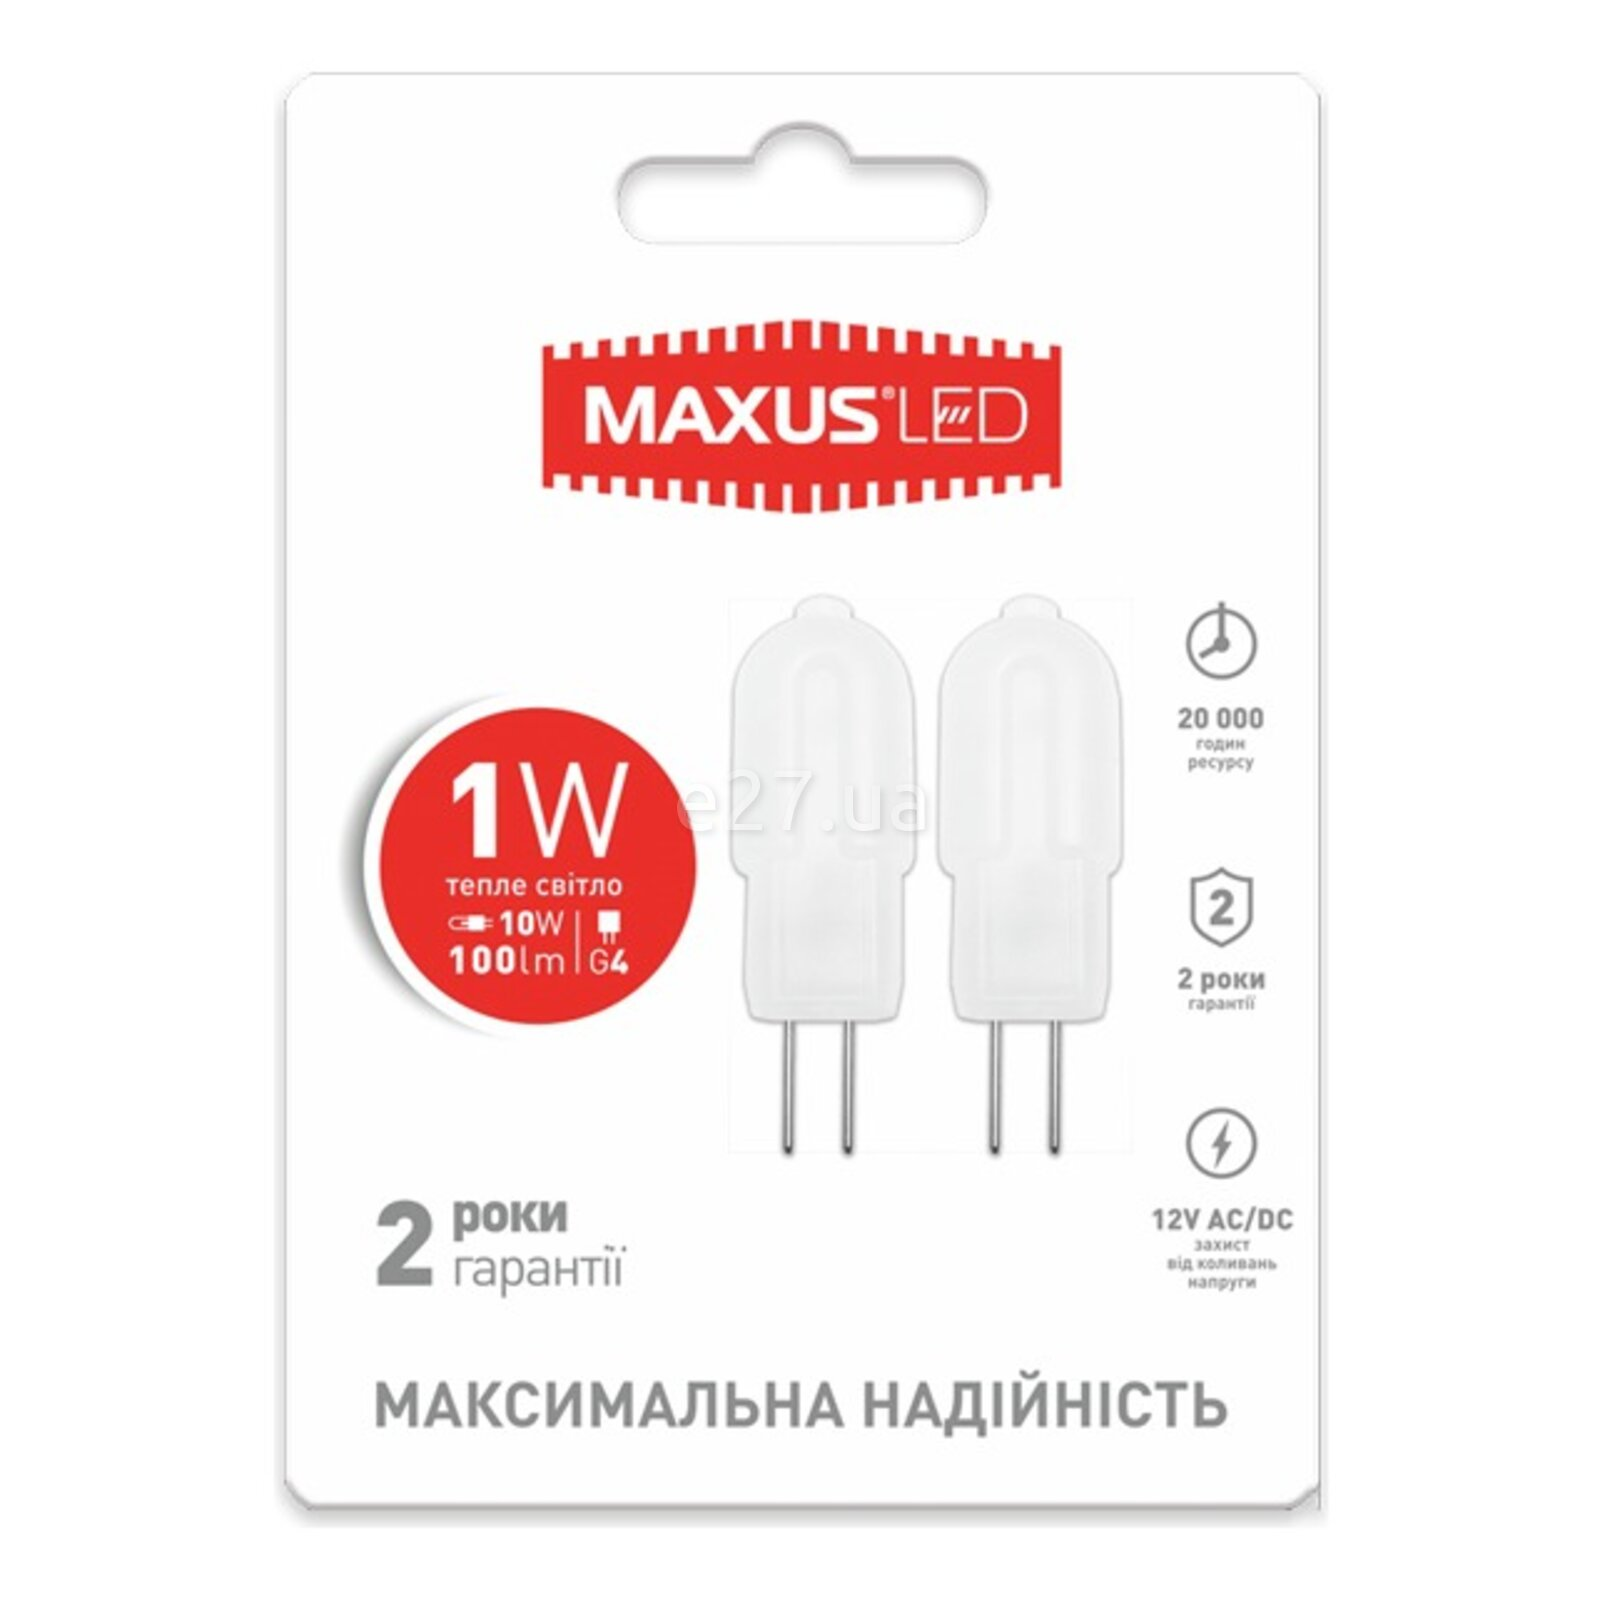 Maxus 2-LED-205 G4 1W 3000K 12V AC/DC (набор из 2 шт)